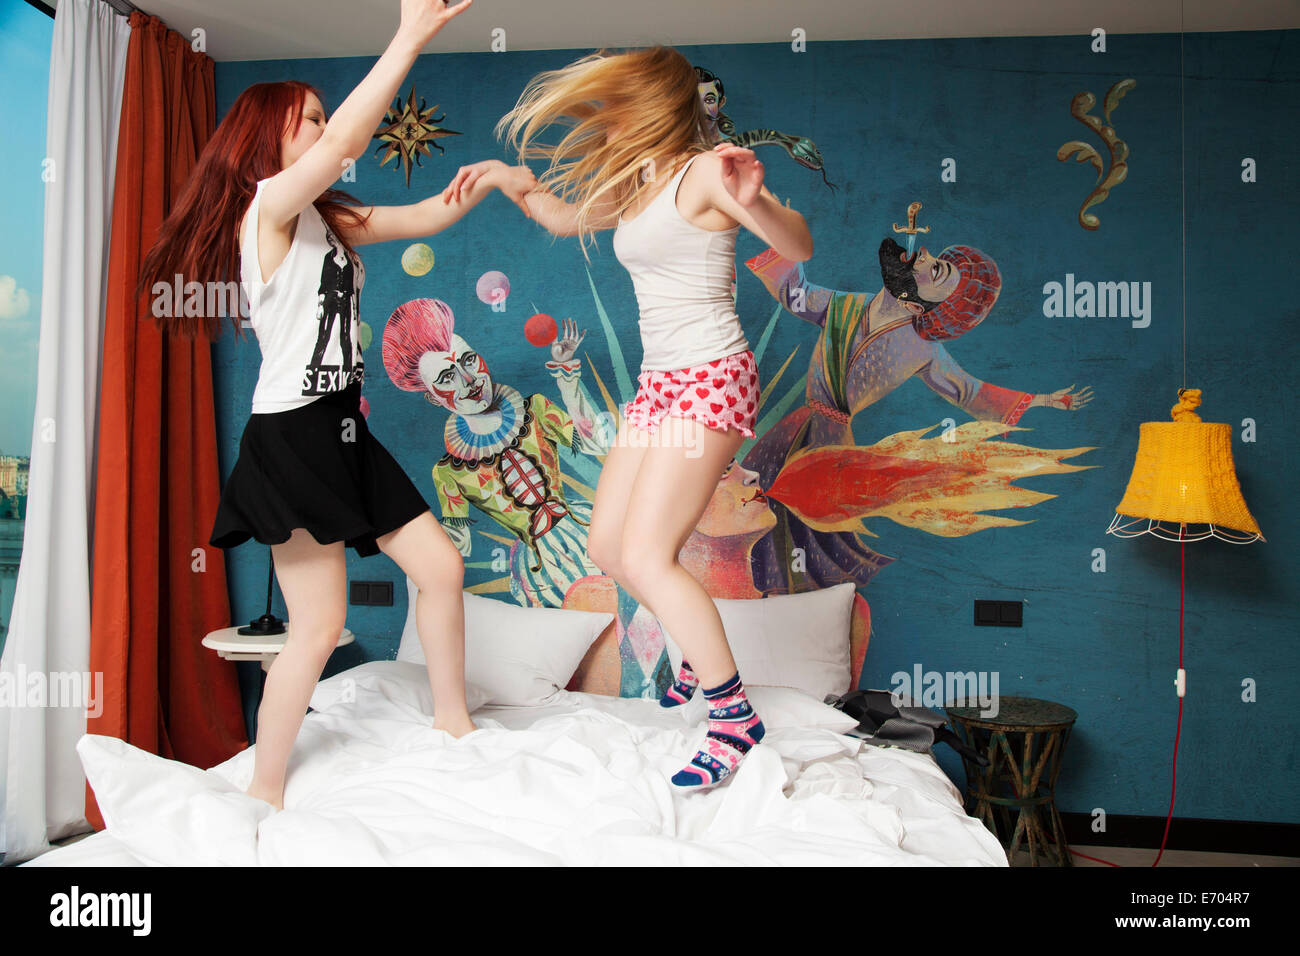 Deux jeunes femmes dancing on hotel bed Photo Stock